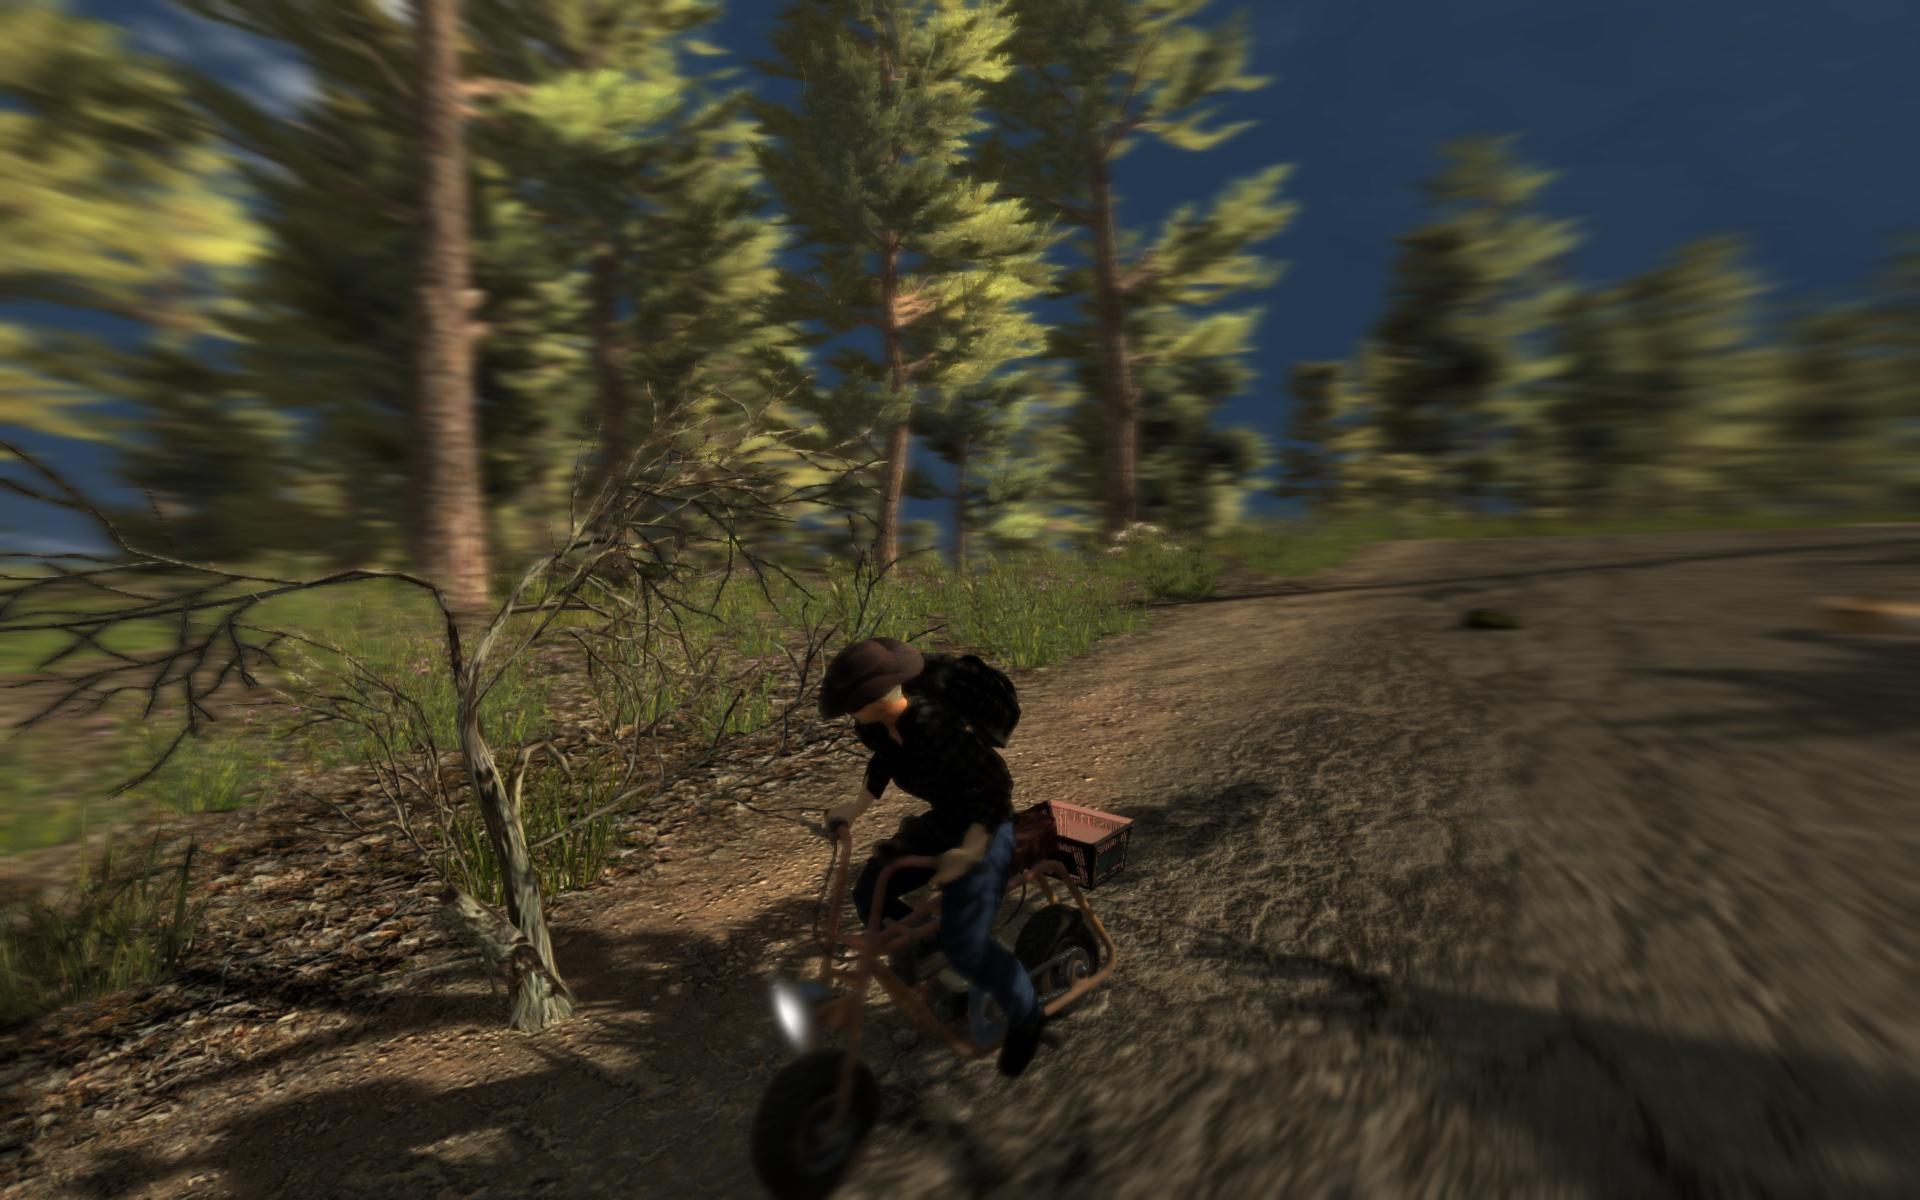 Alpha_12_Minibike_Motion_Blur Alpha_12_Bear_Motion_Blur.  Alpha_12_Minibike_Bloodmoon Alpha_12_Snow_Diersville